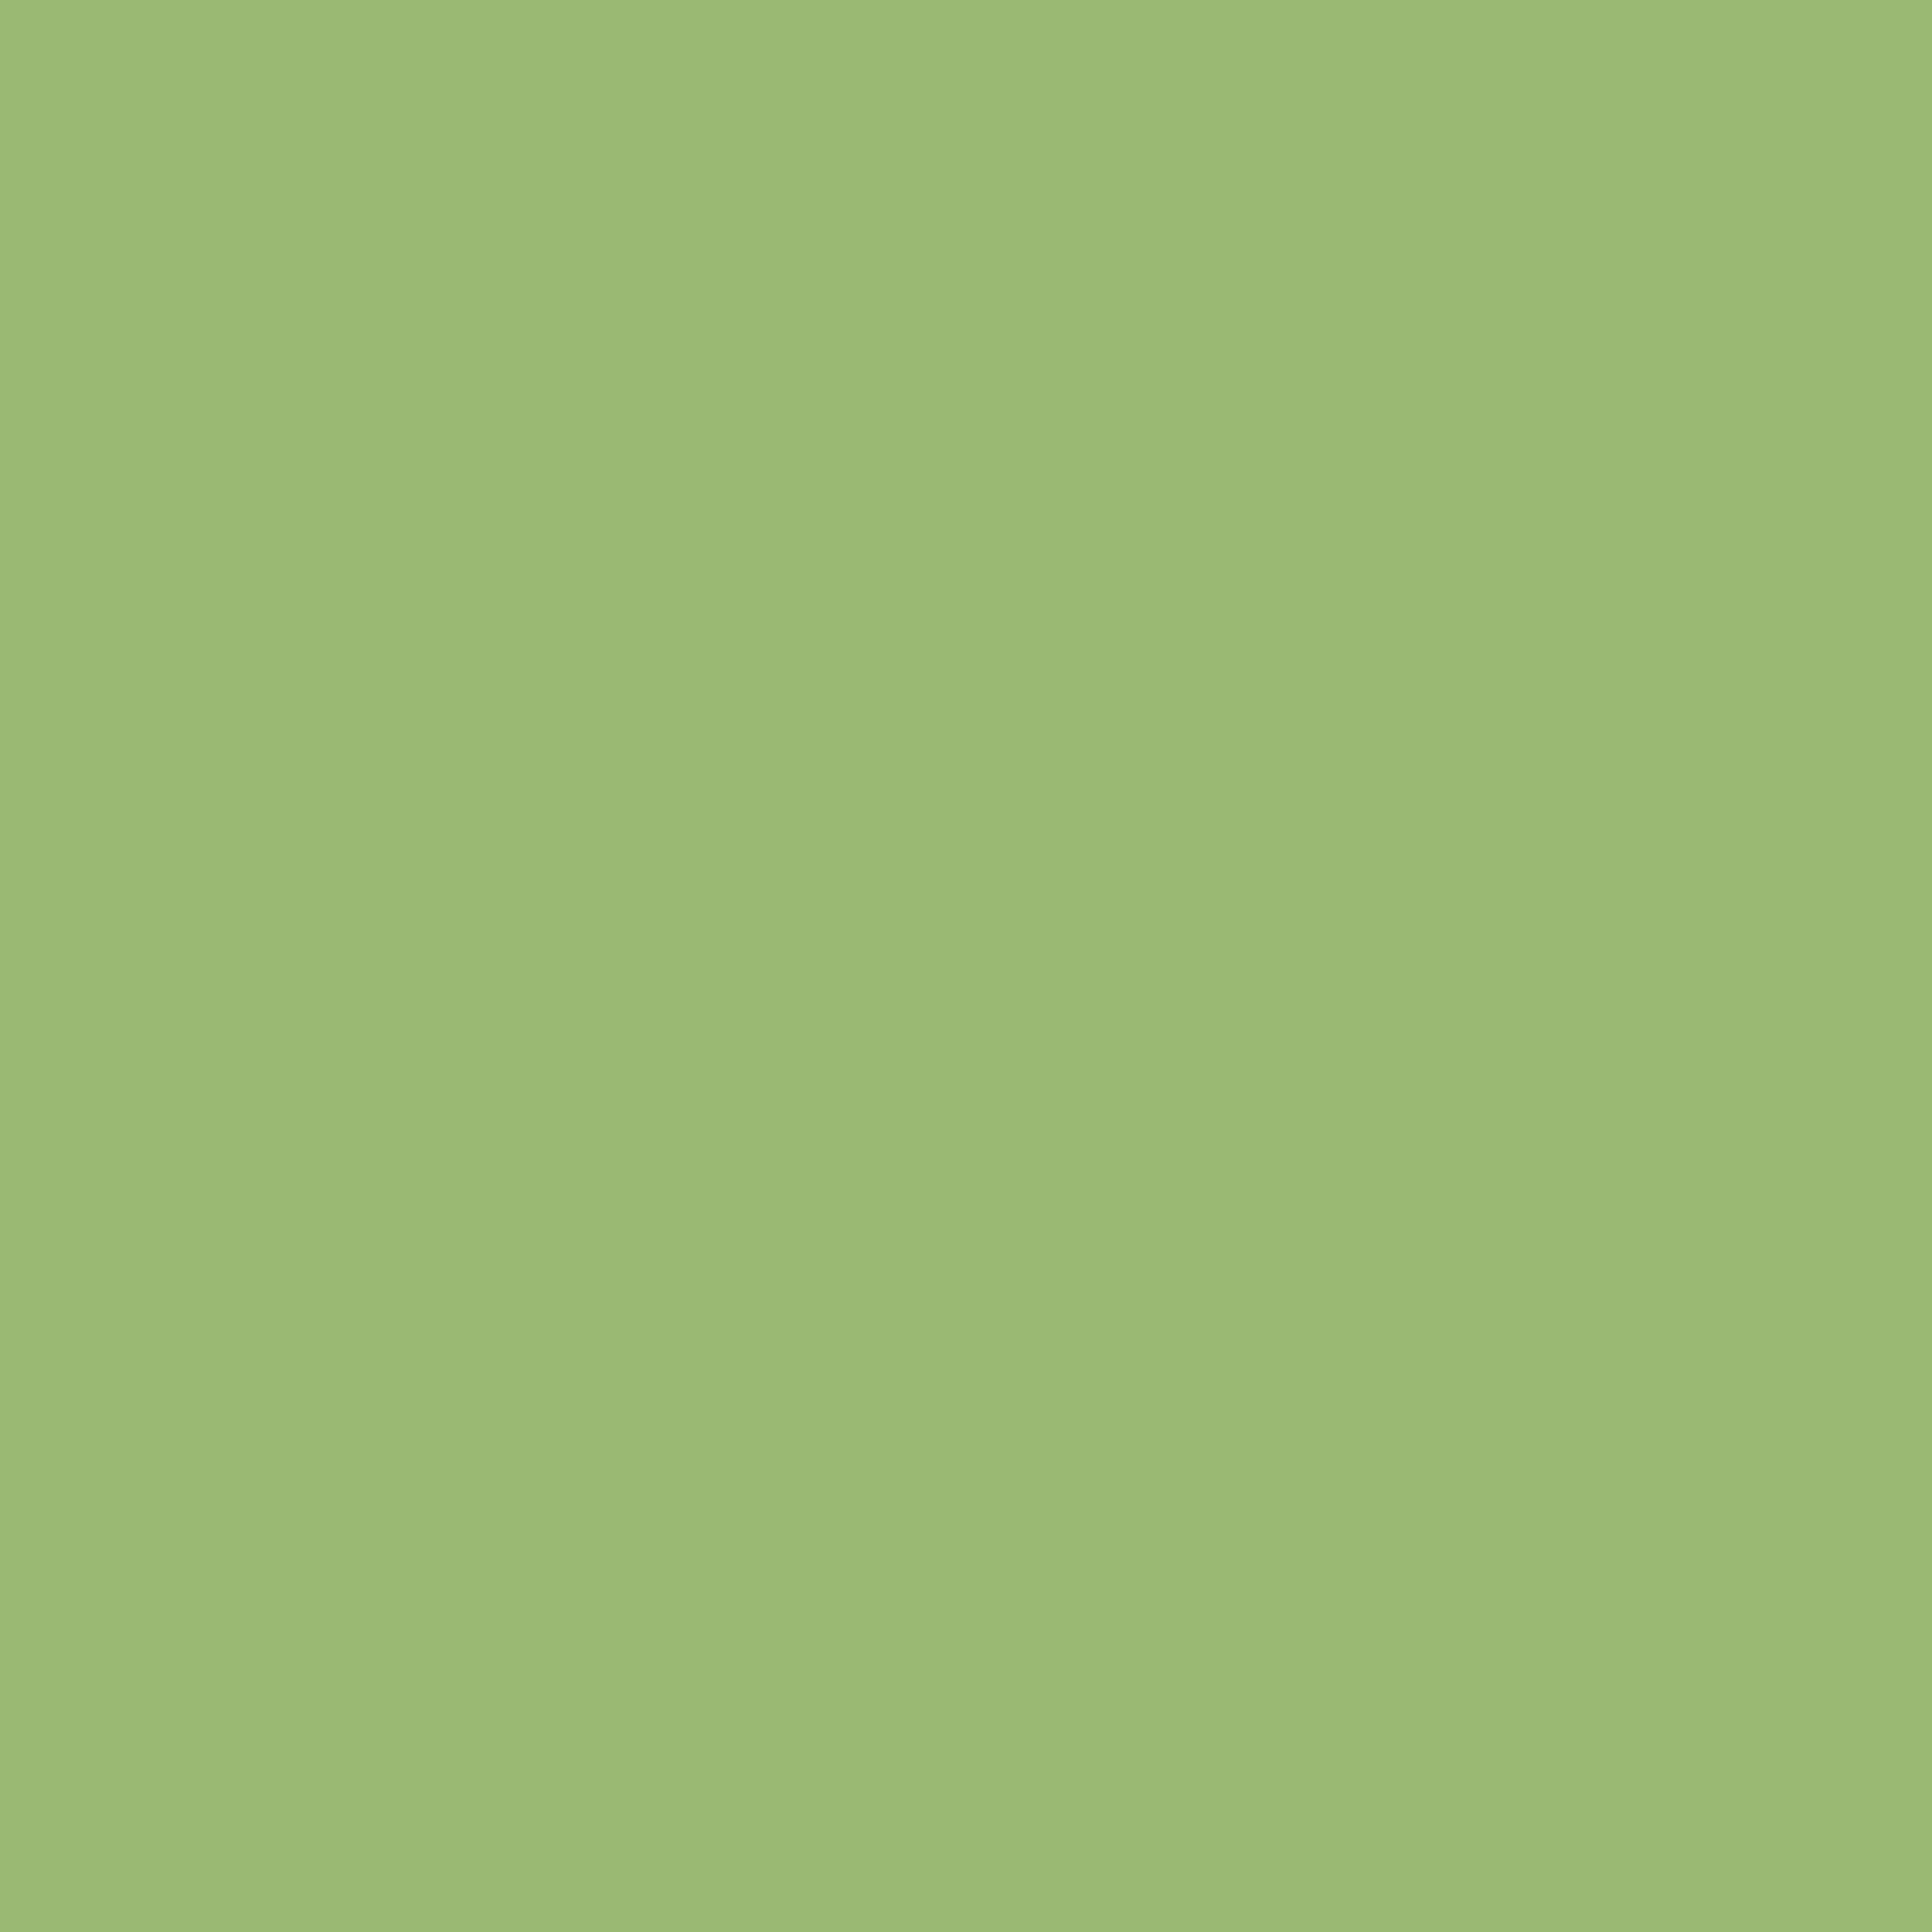 2048x2048 Olivine Solid Color Background